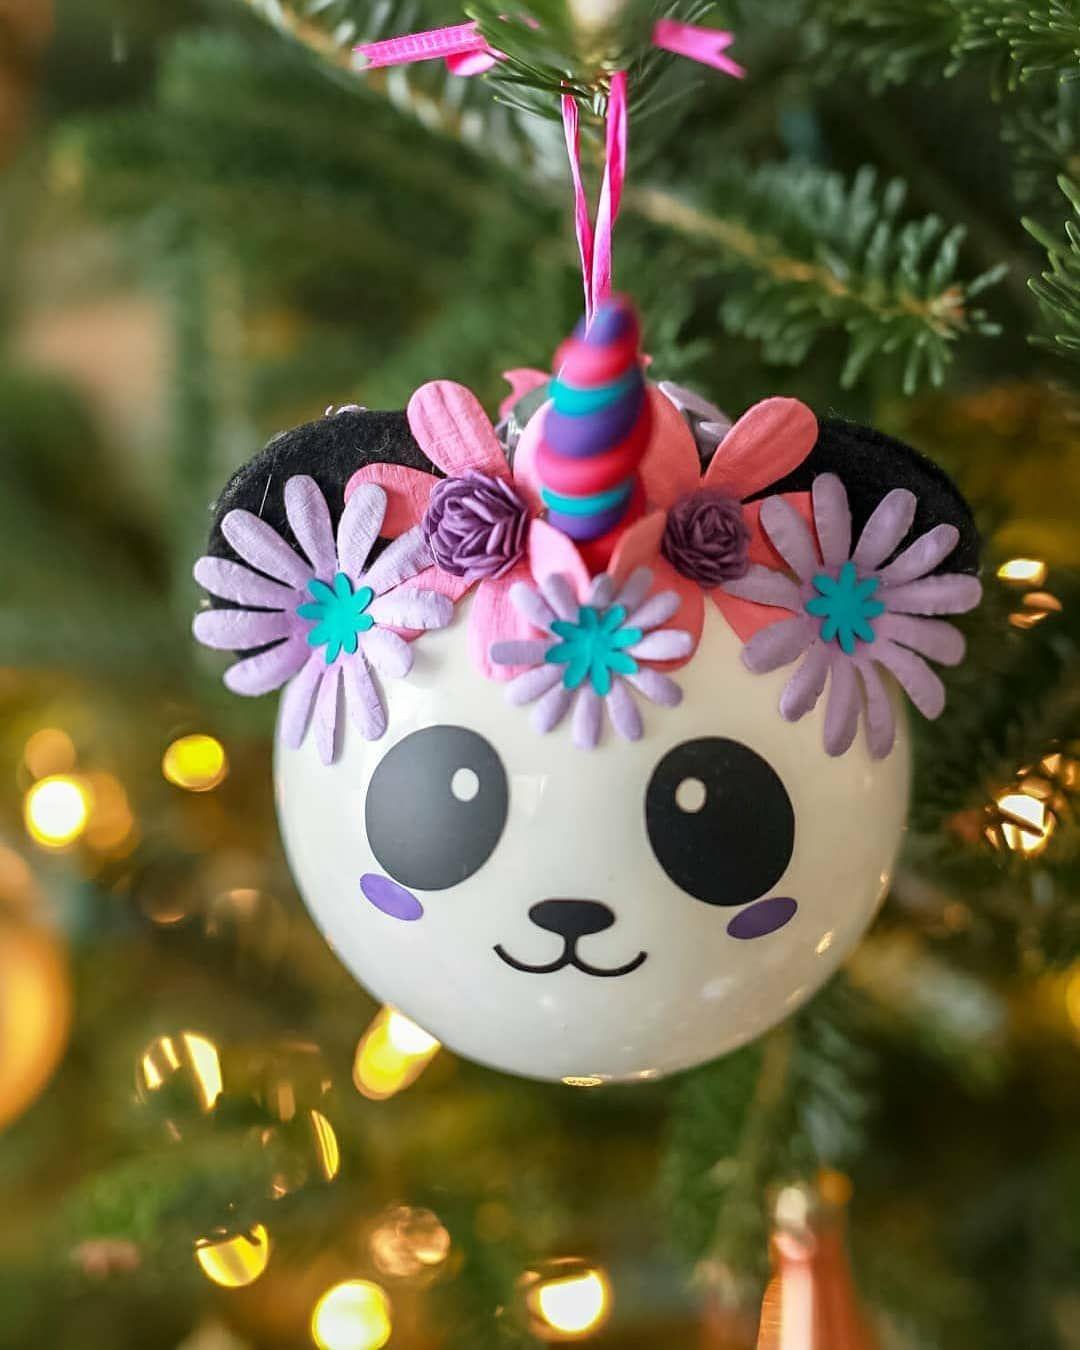 Diy Pandacorn Ornaments Diy Christmas Ornaments Kids Christmas Ornament Kids Christmas Ornaments Diy Christmas Ornaments Rustic Diy Christmas Ornaments Easy